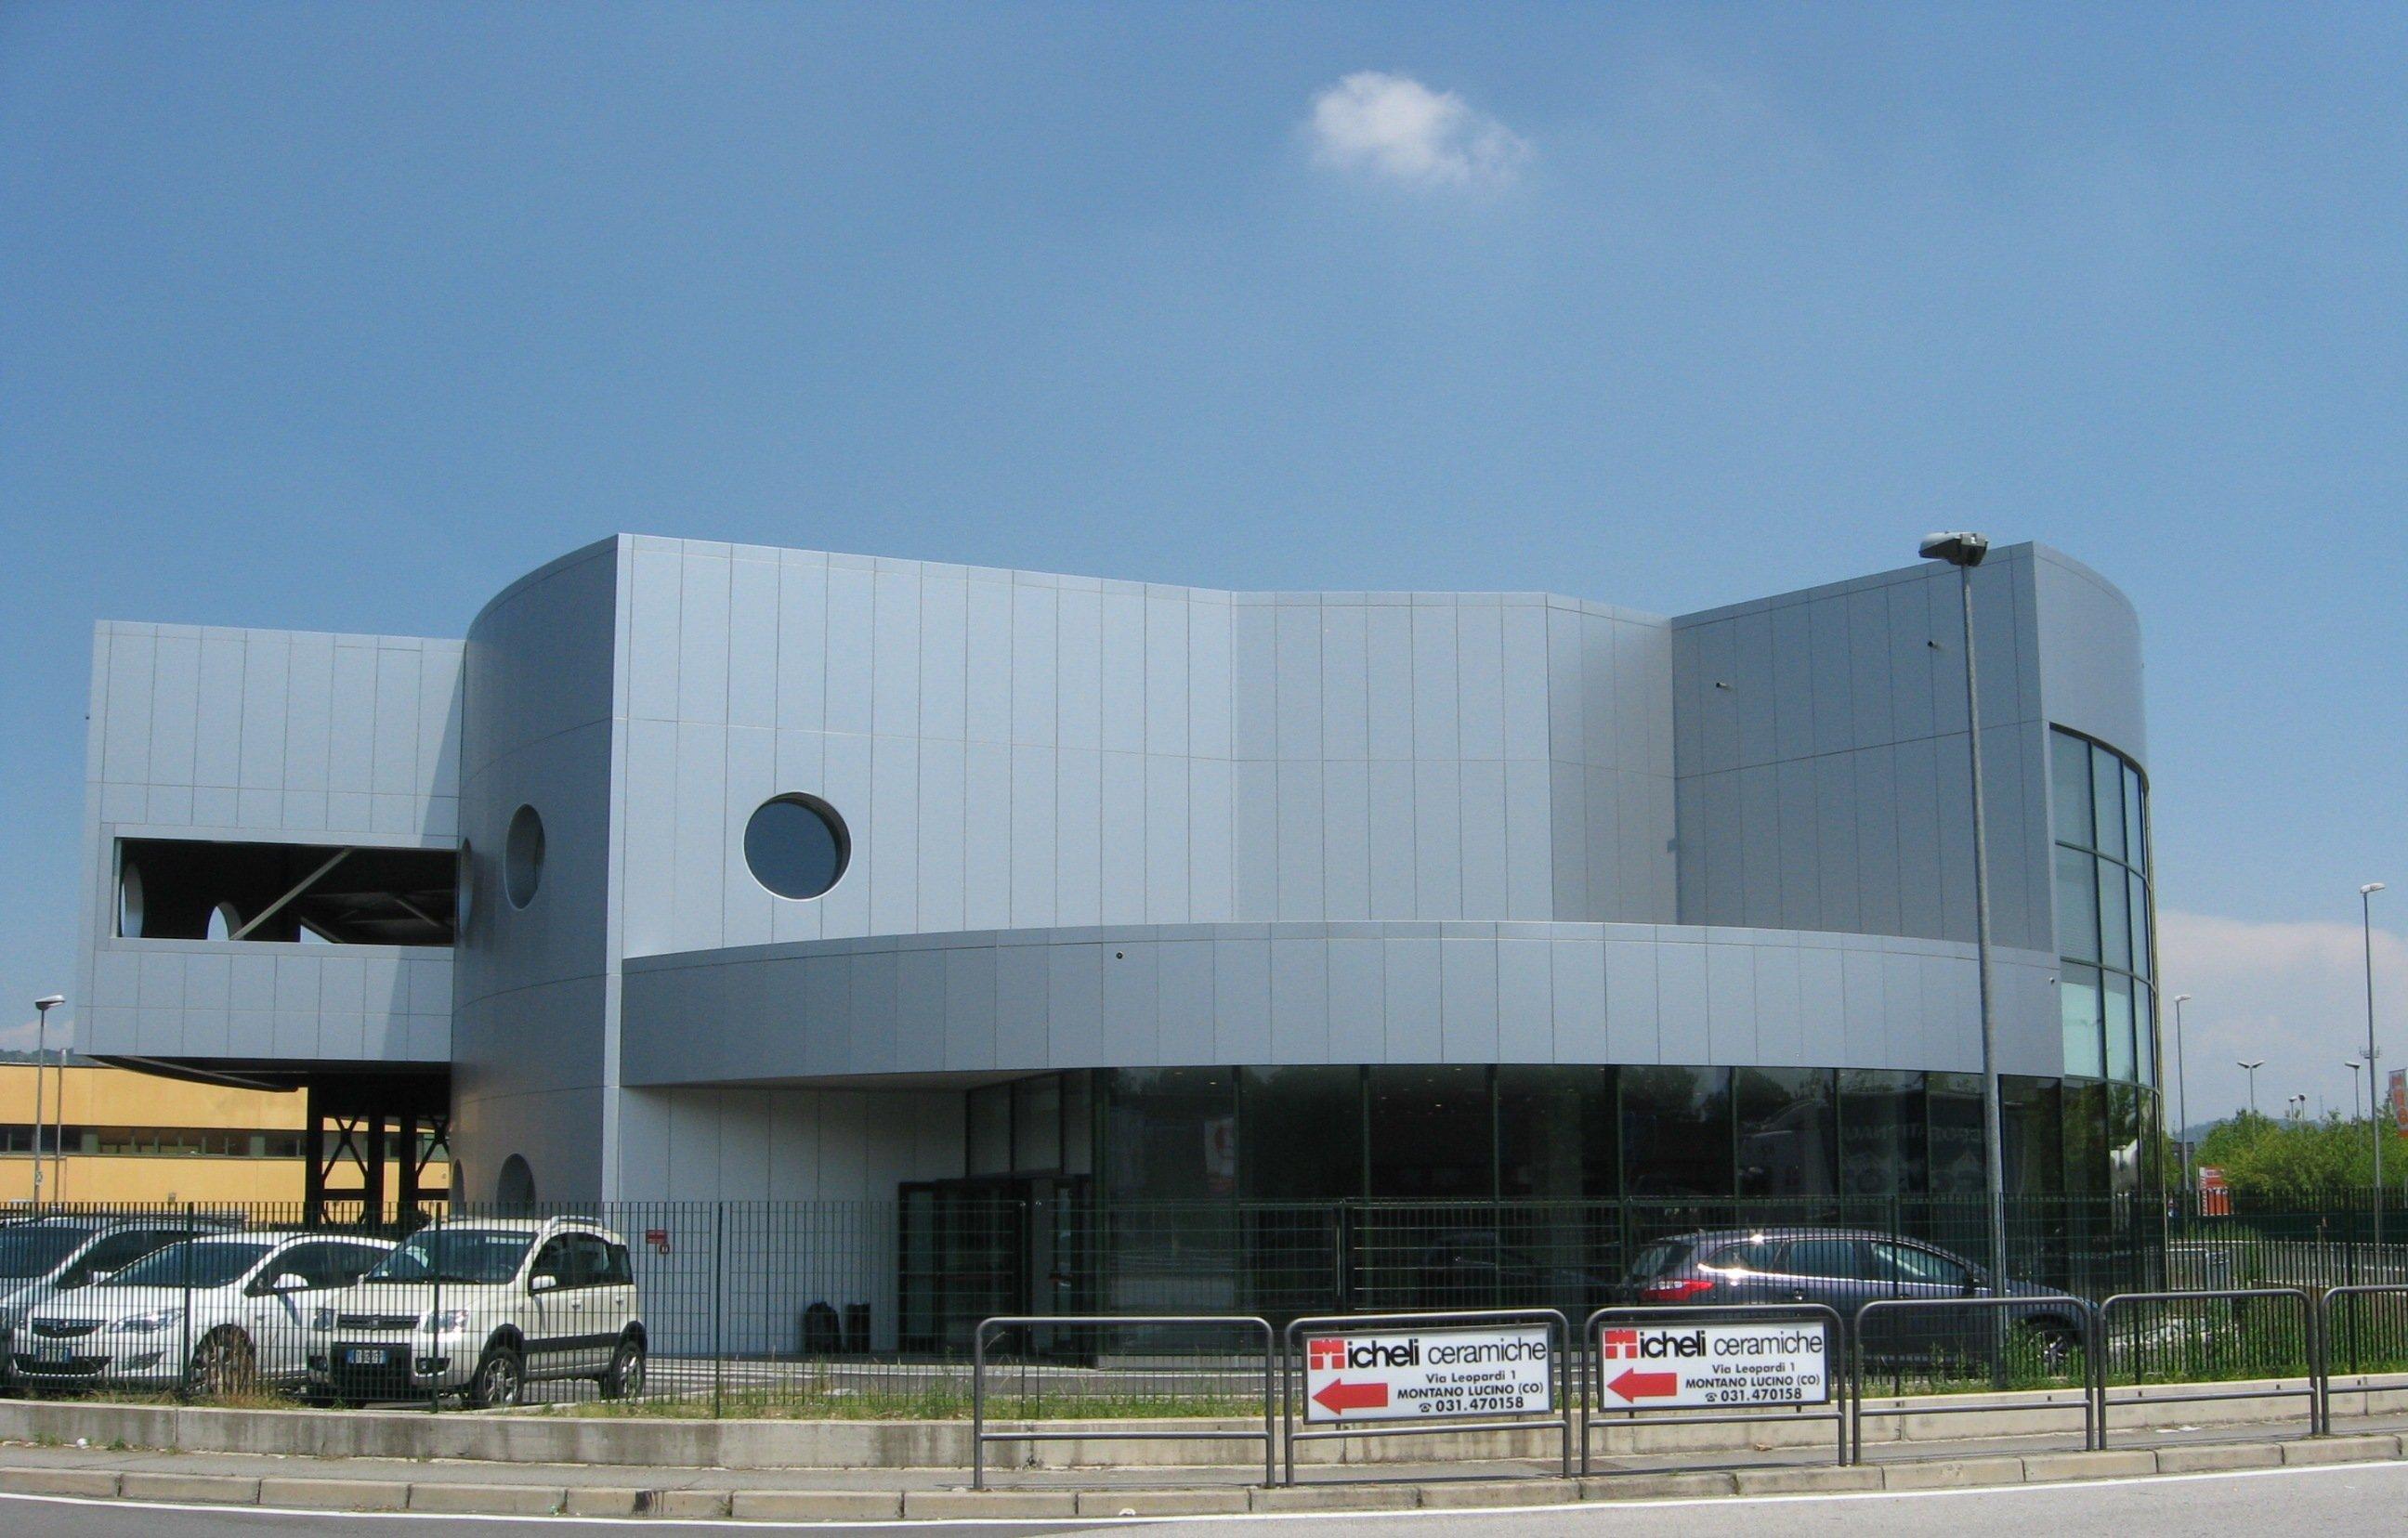 Centro Commerciale - Montano Lucino (CO)